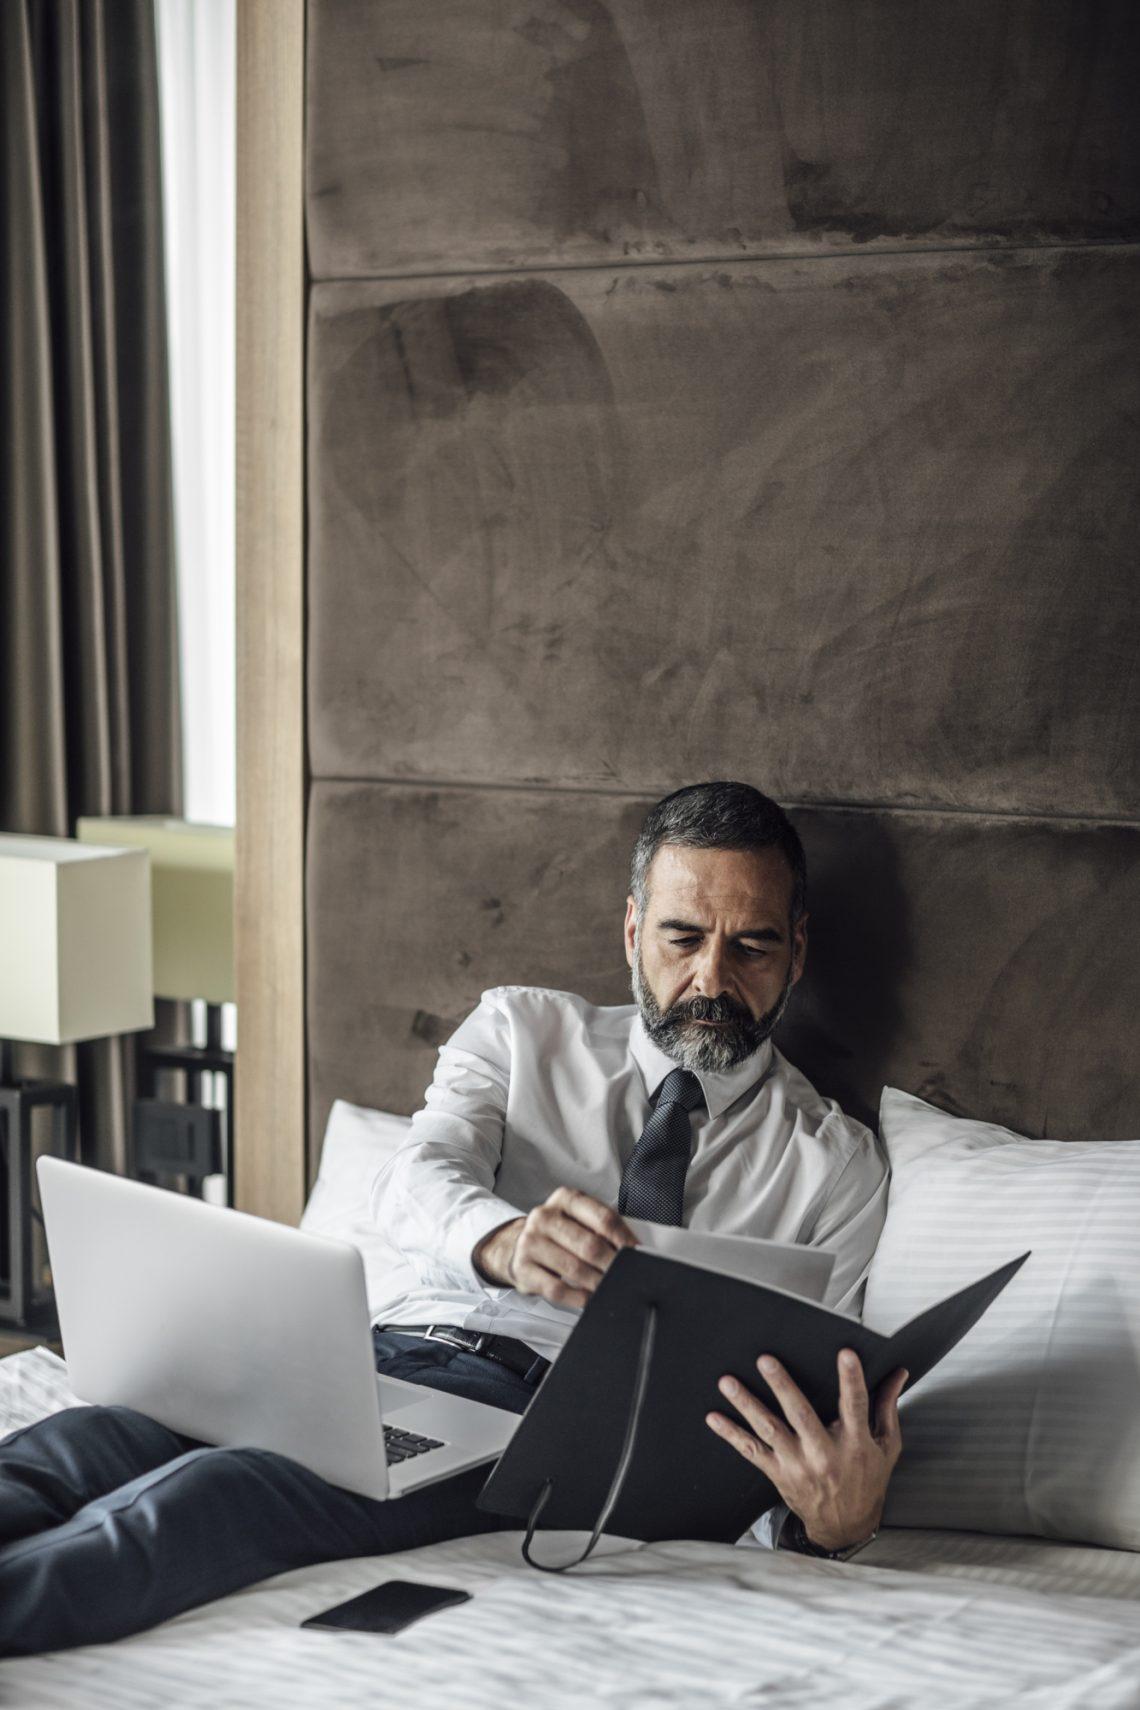 мужчина работает за ноутбуком и просматривает бумаги фото